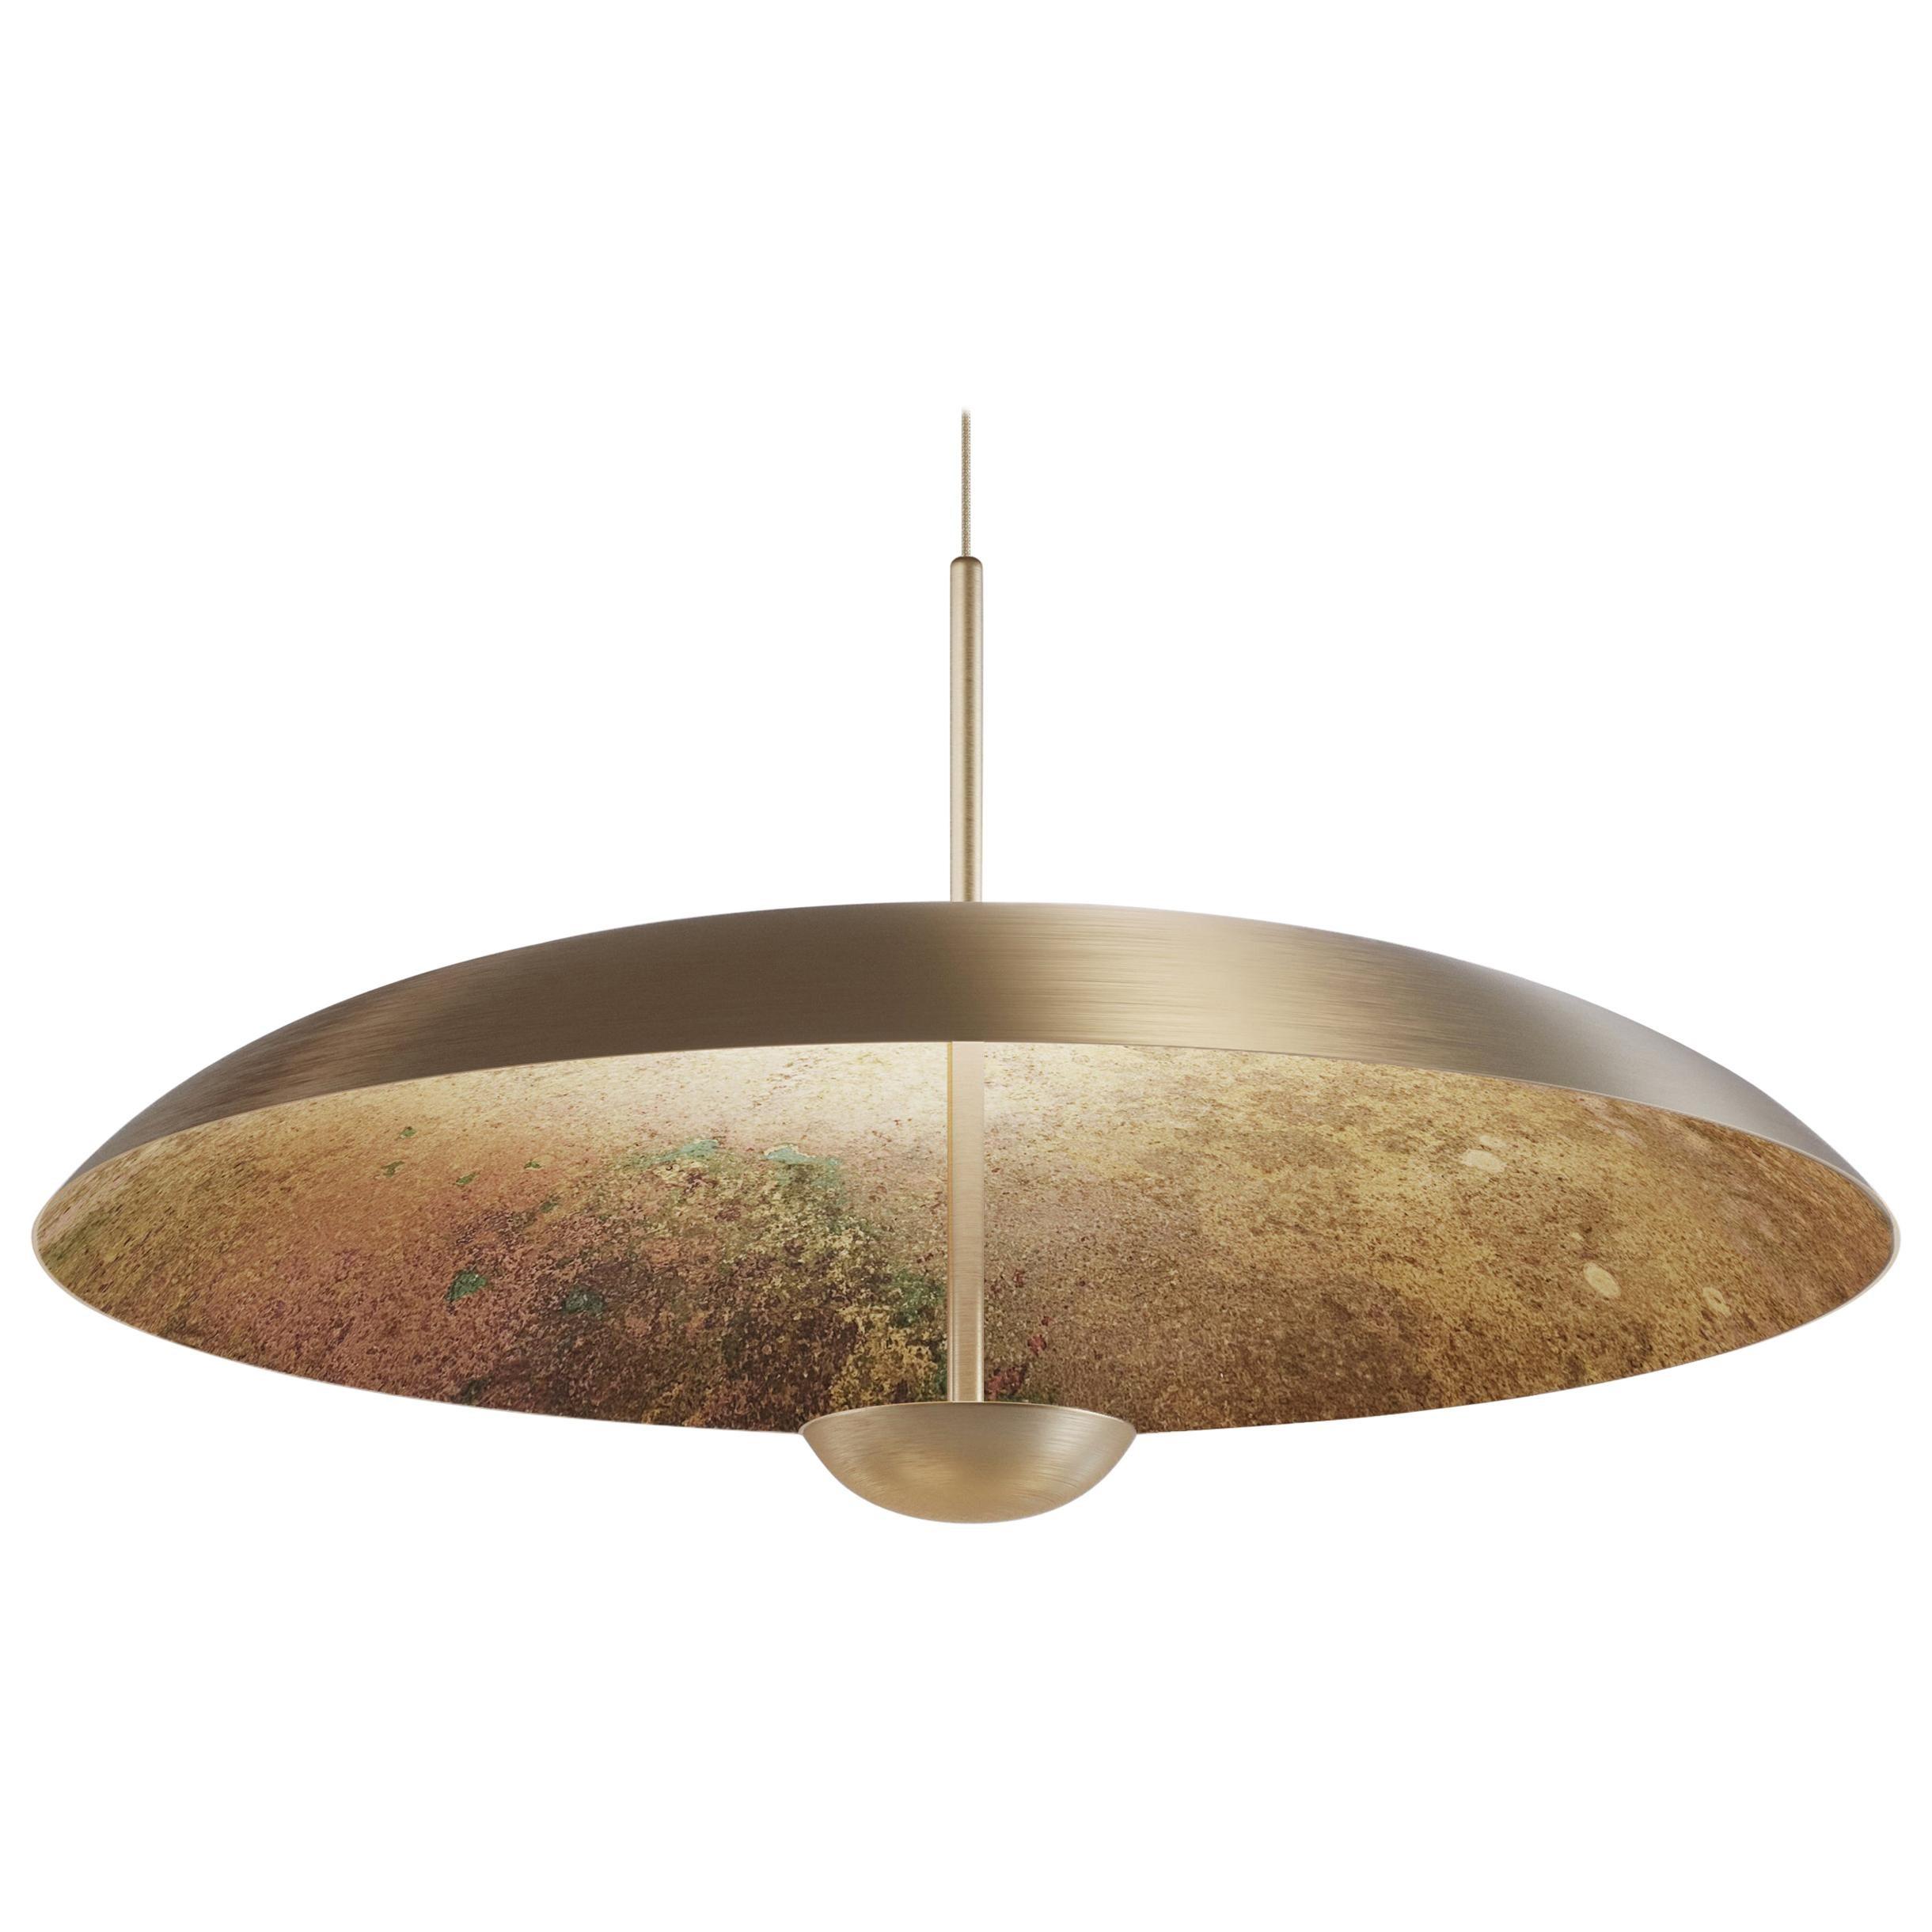 'Cosmic Oxidium' Mixed Color Patina Brass Pendant Ceiling Lamp, Chandelier